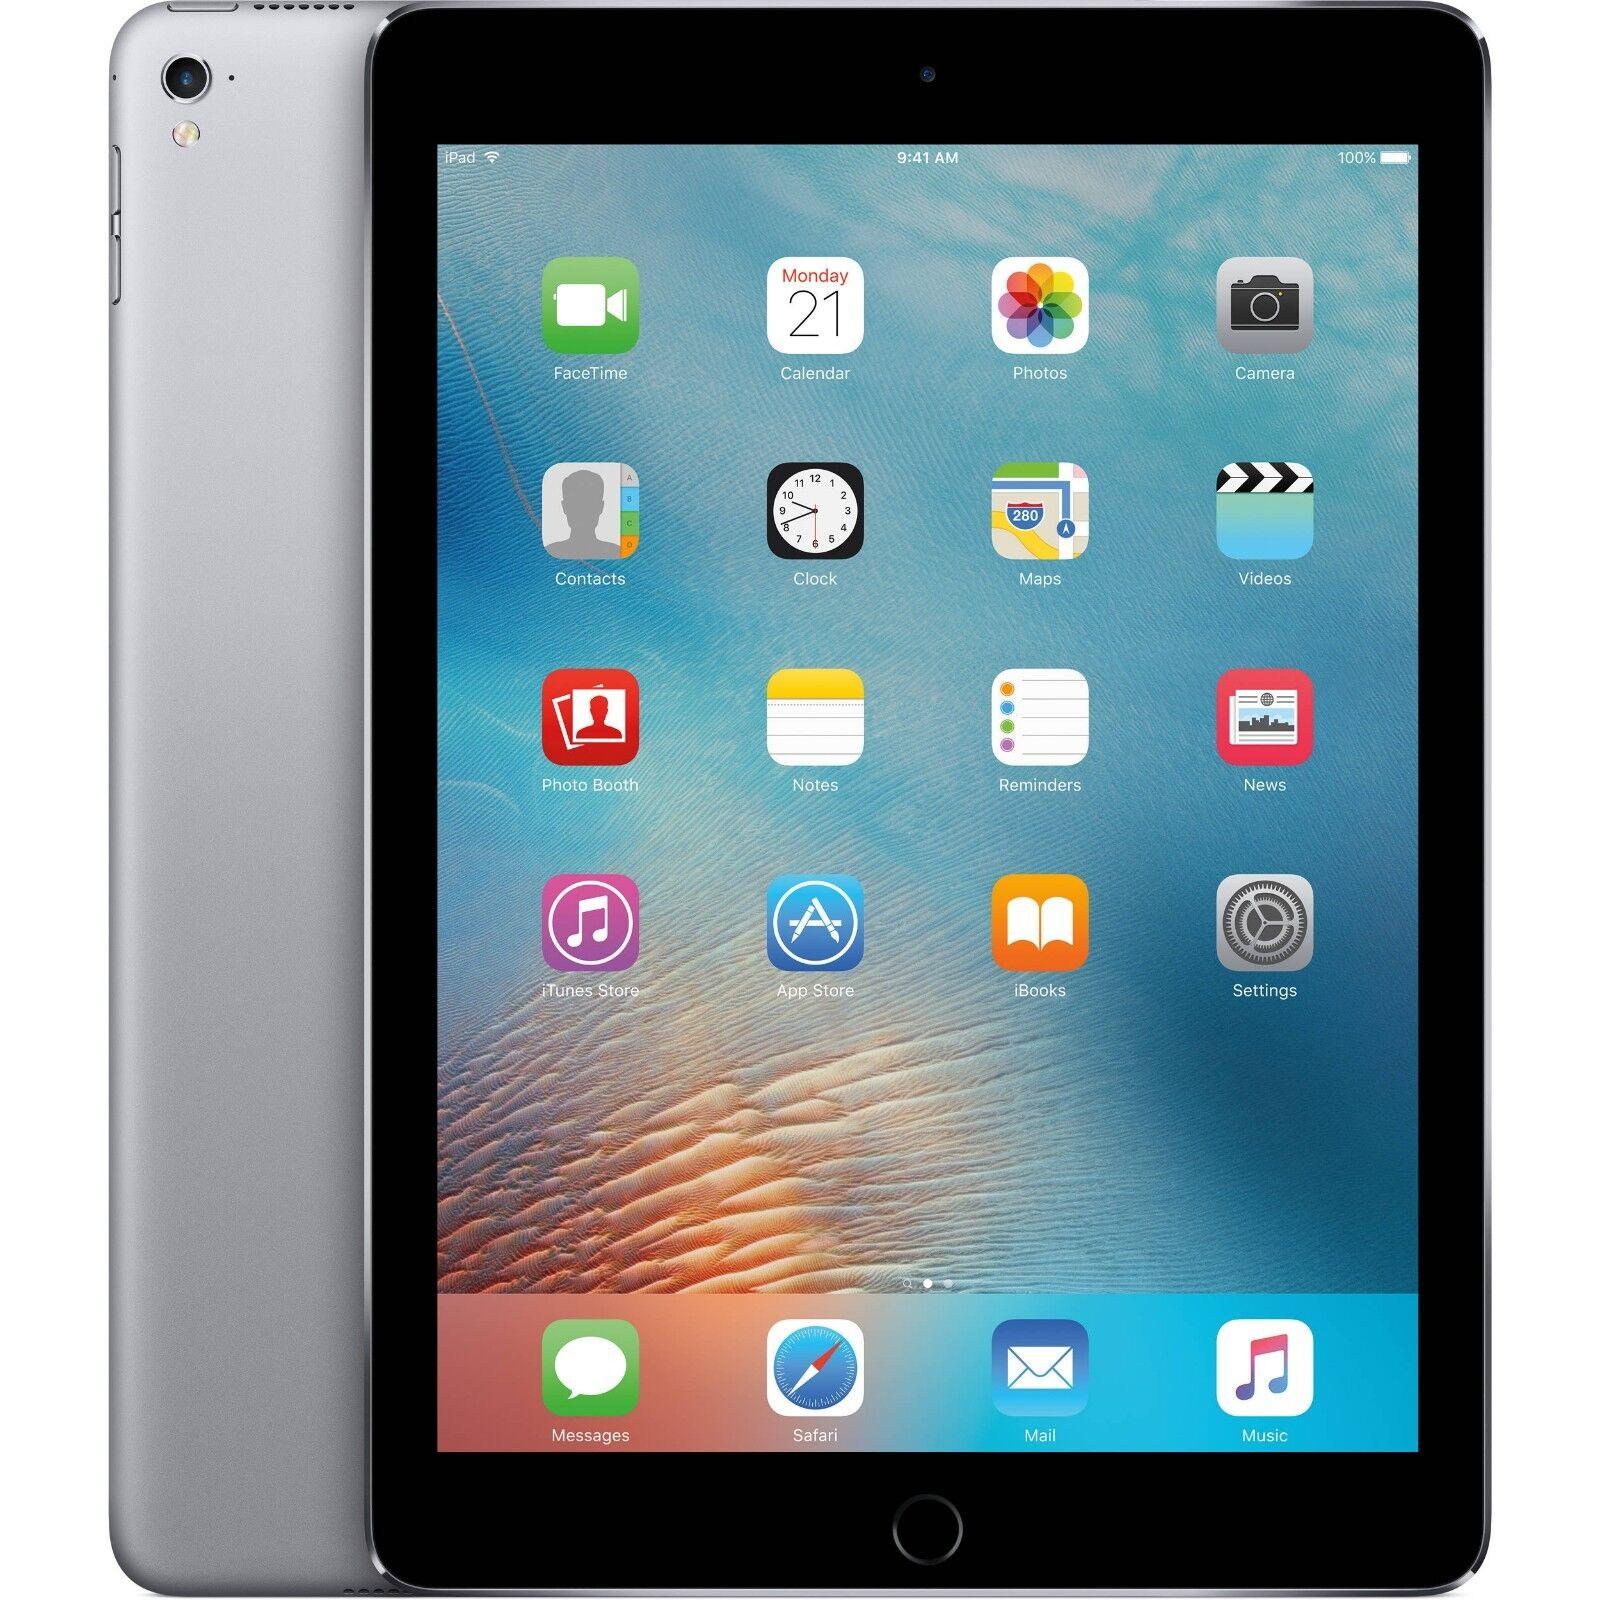 "Ipad - Apple iPad Pro 12.9"" Retina Display 128GB, Wi-Fi Space Gray - ML0N2LL/A"